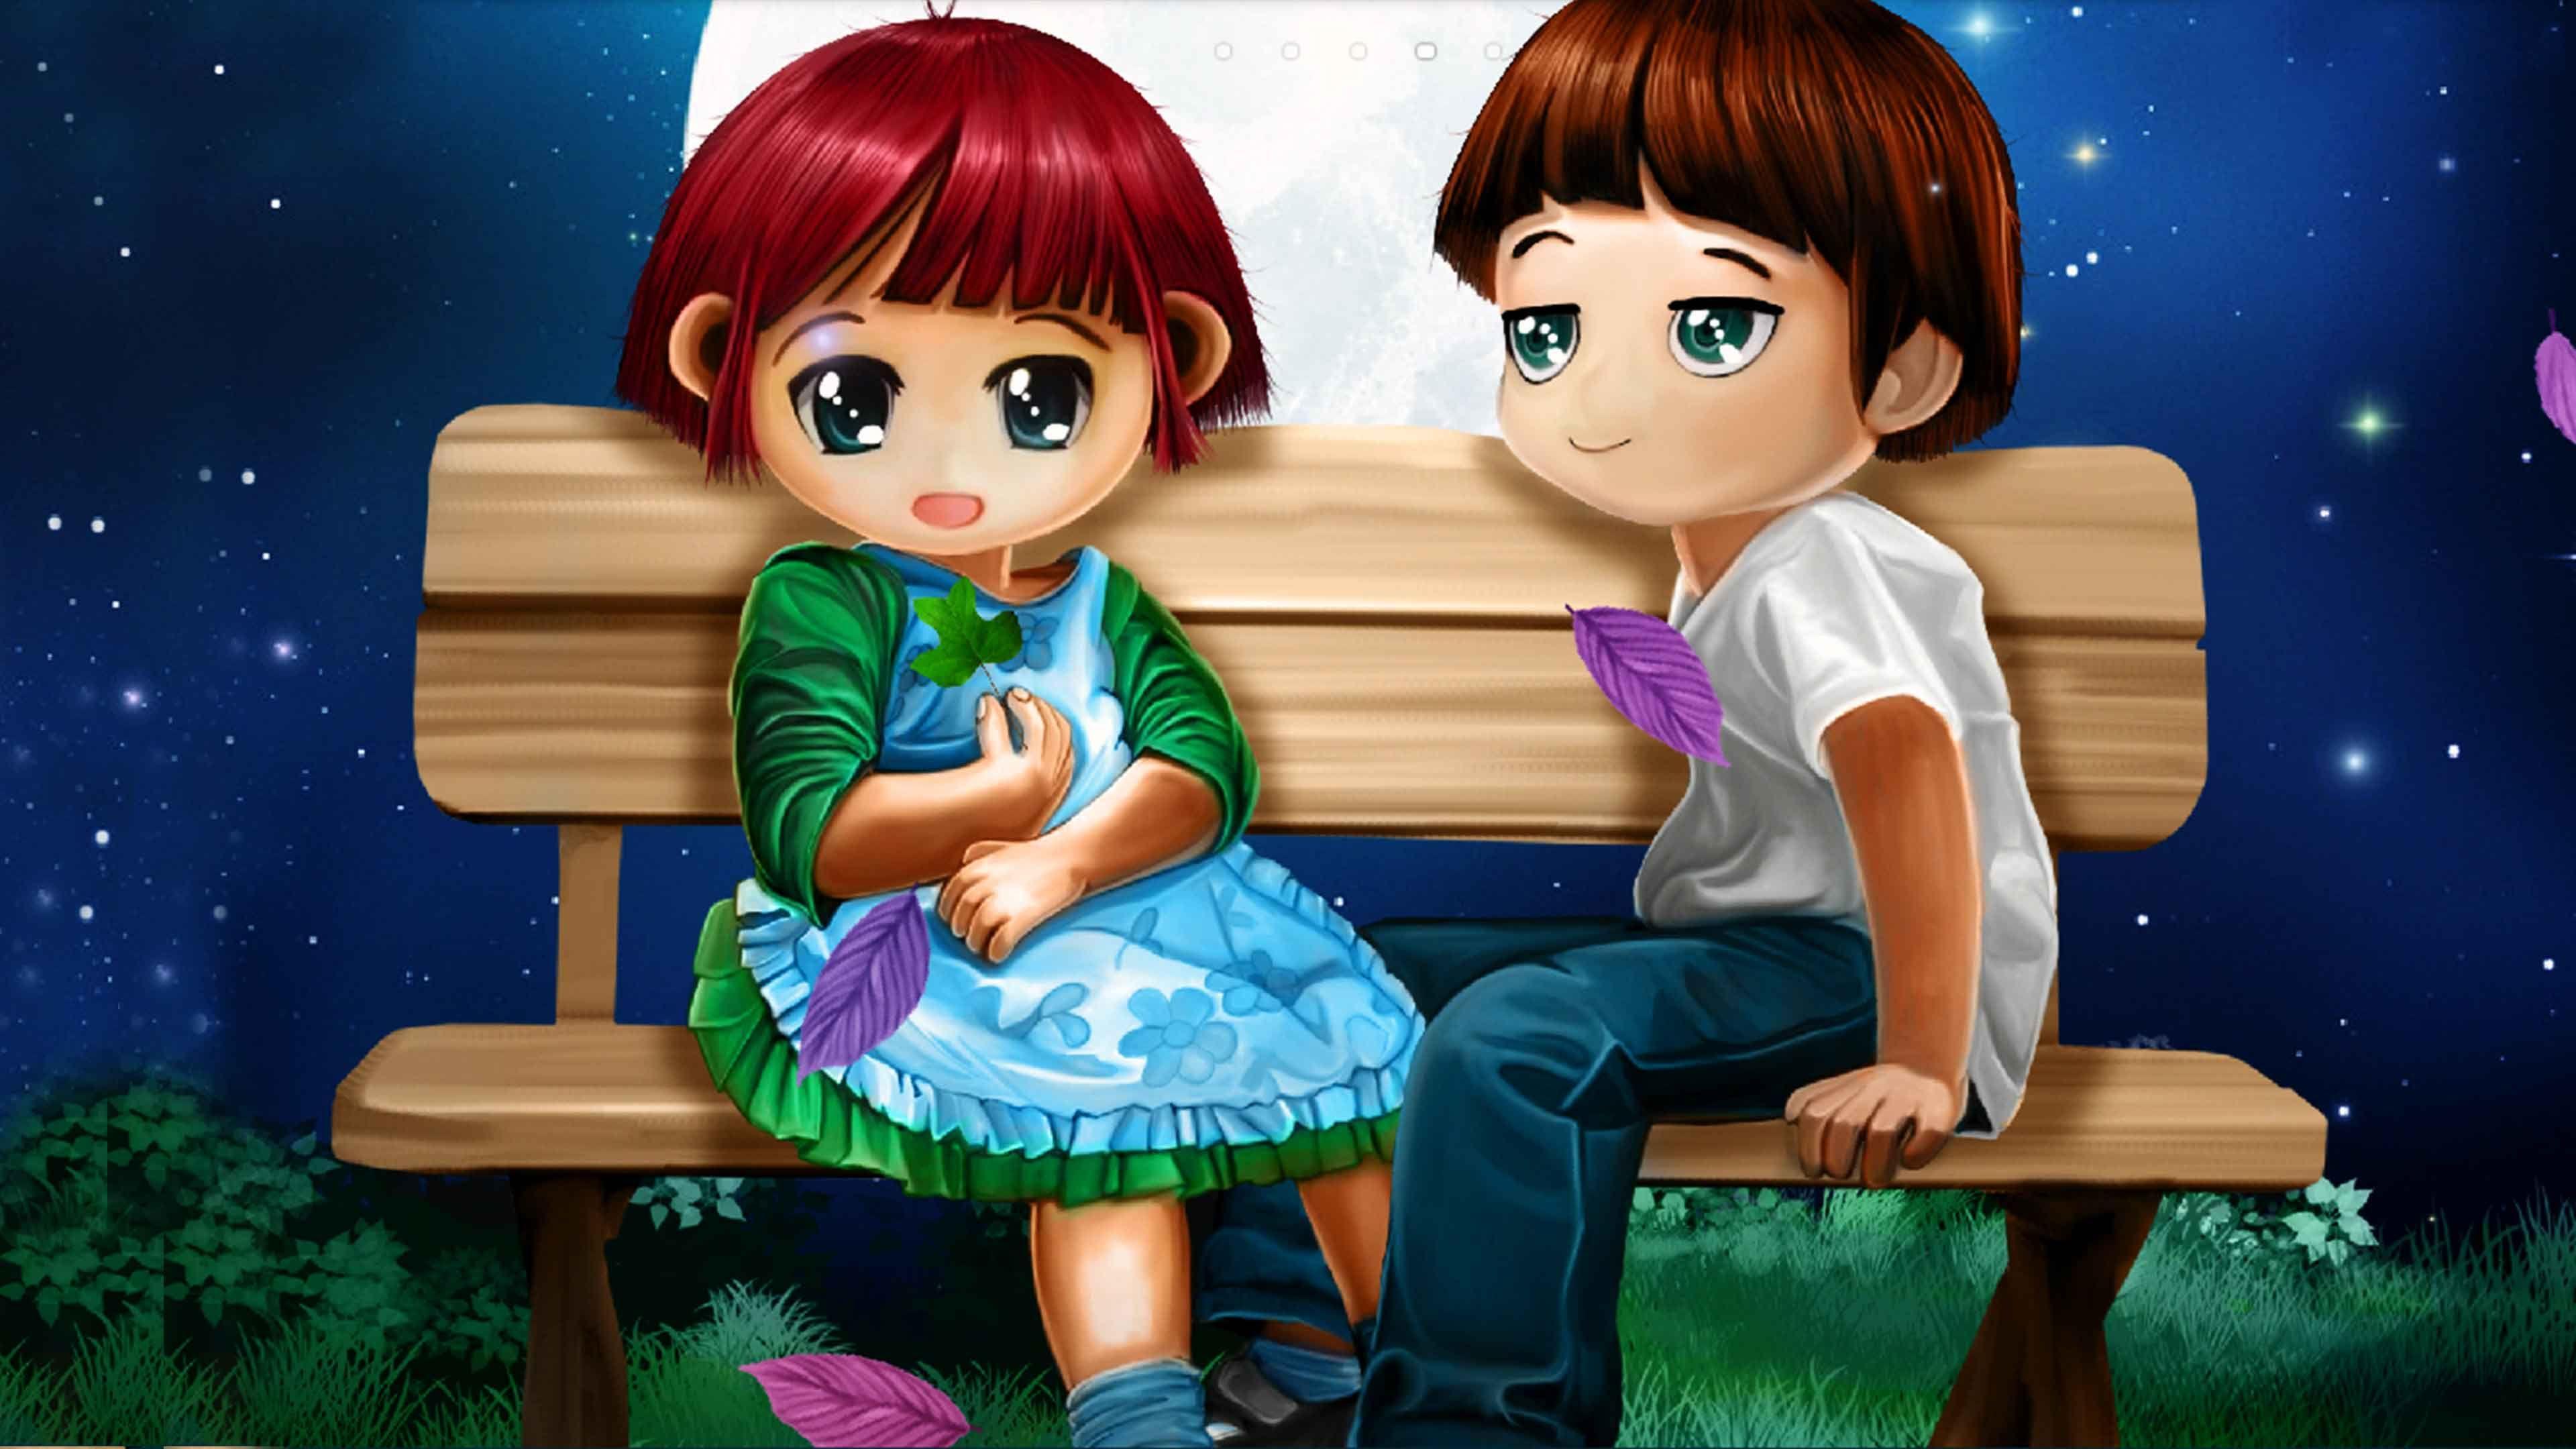 Cartoon love hd wallpapers wallpaper cave - Love wallpaper download 3d ...